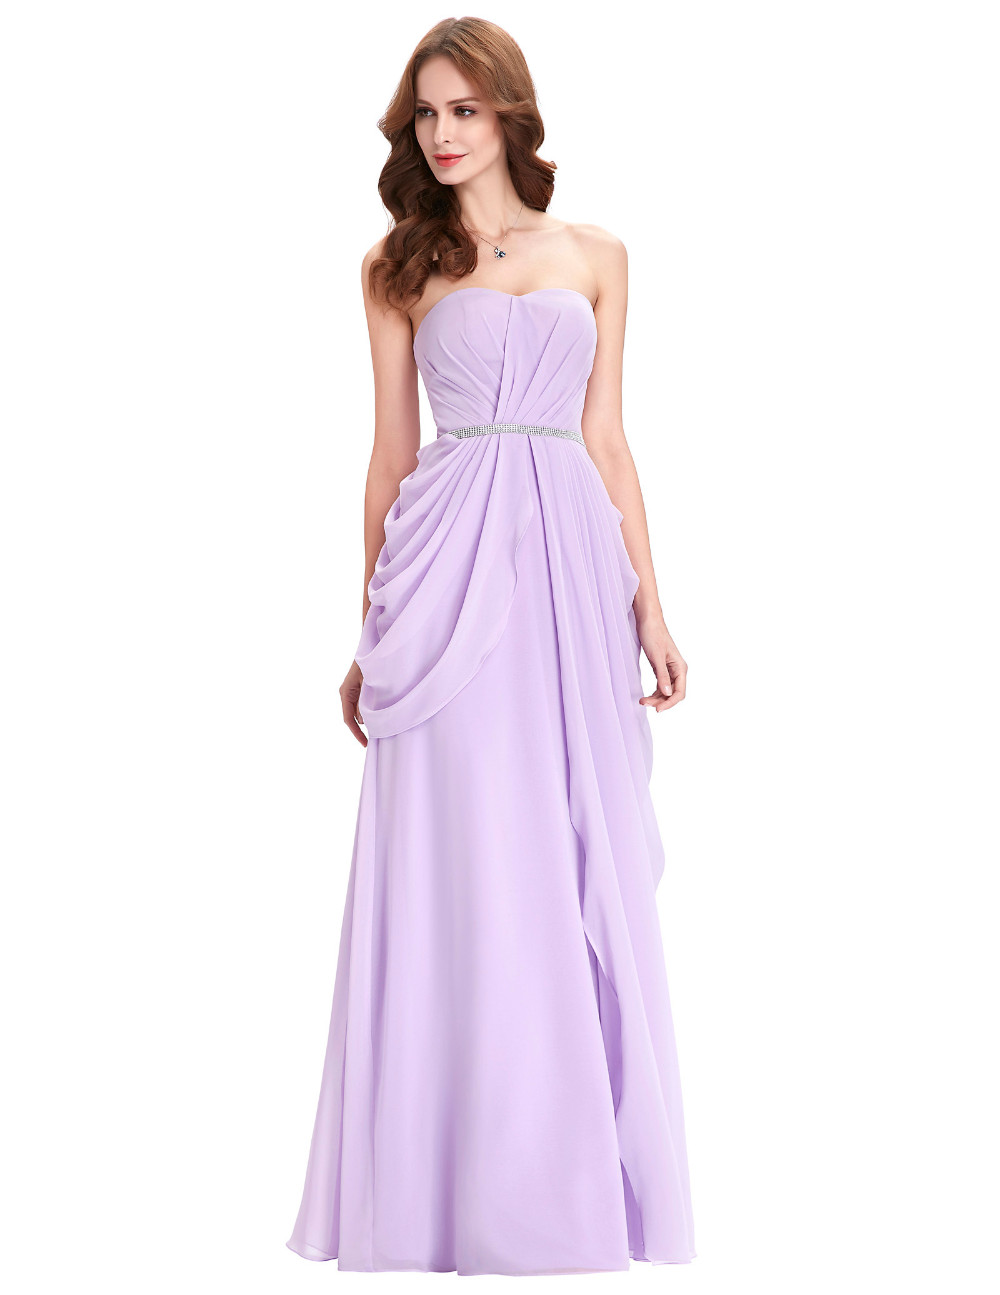 Asombroso Vestidos De Dama De Color Púrpura Oscuro Galería ...